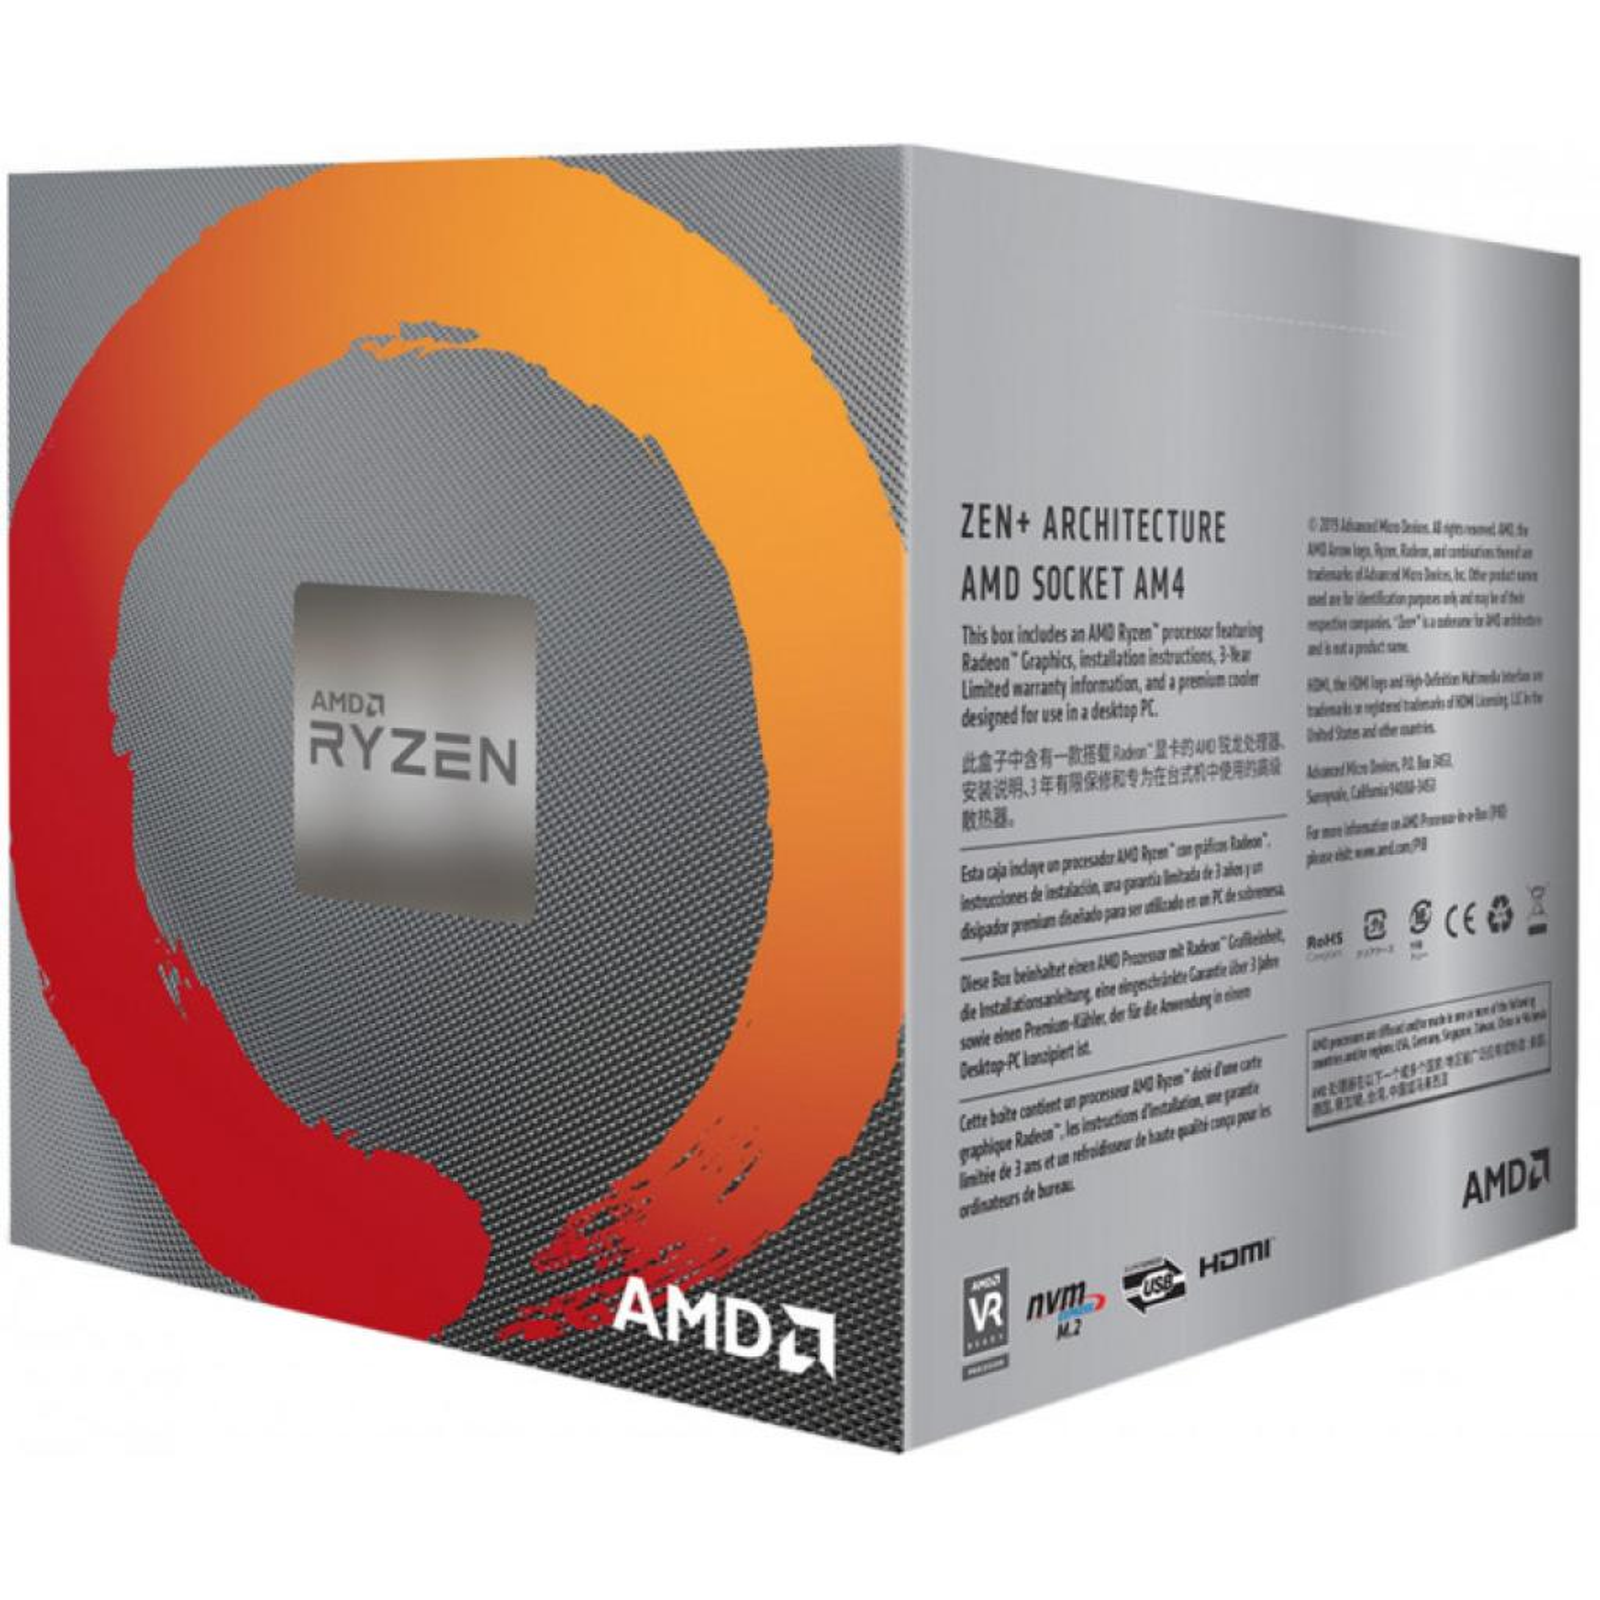 Процесор AMD Ryzen 5 3400G (YD3400C5FHMPK) зображення 3